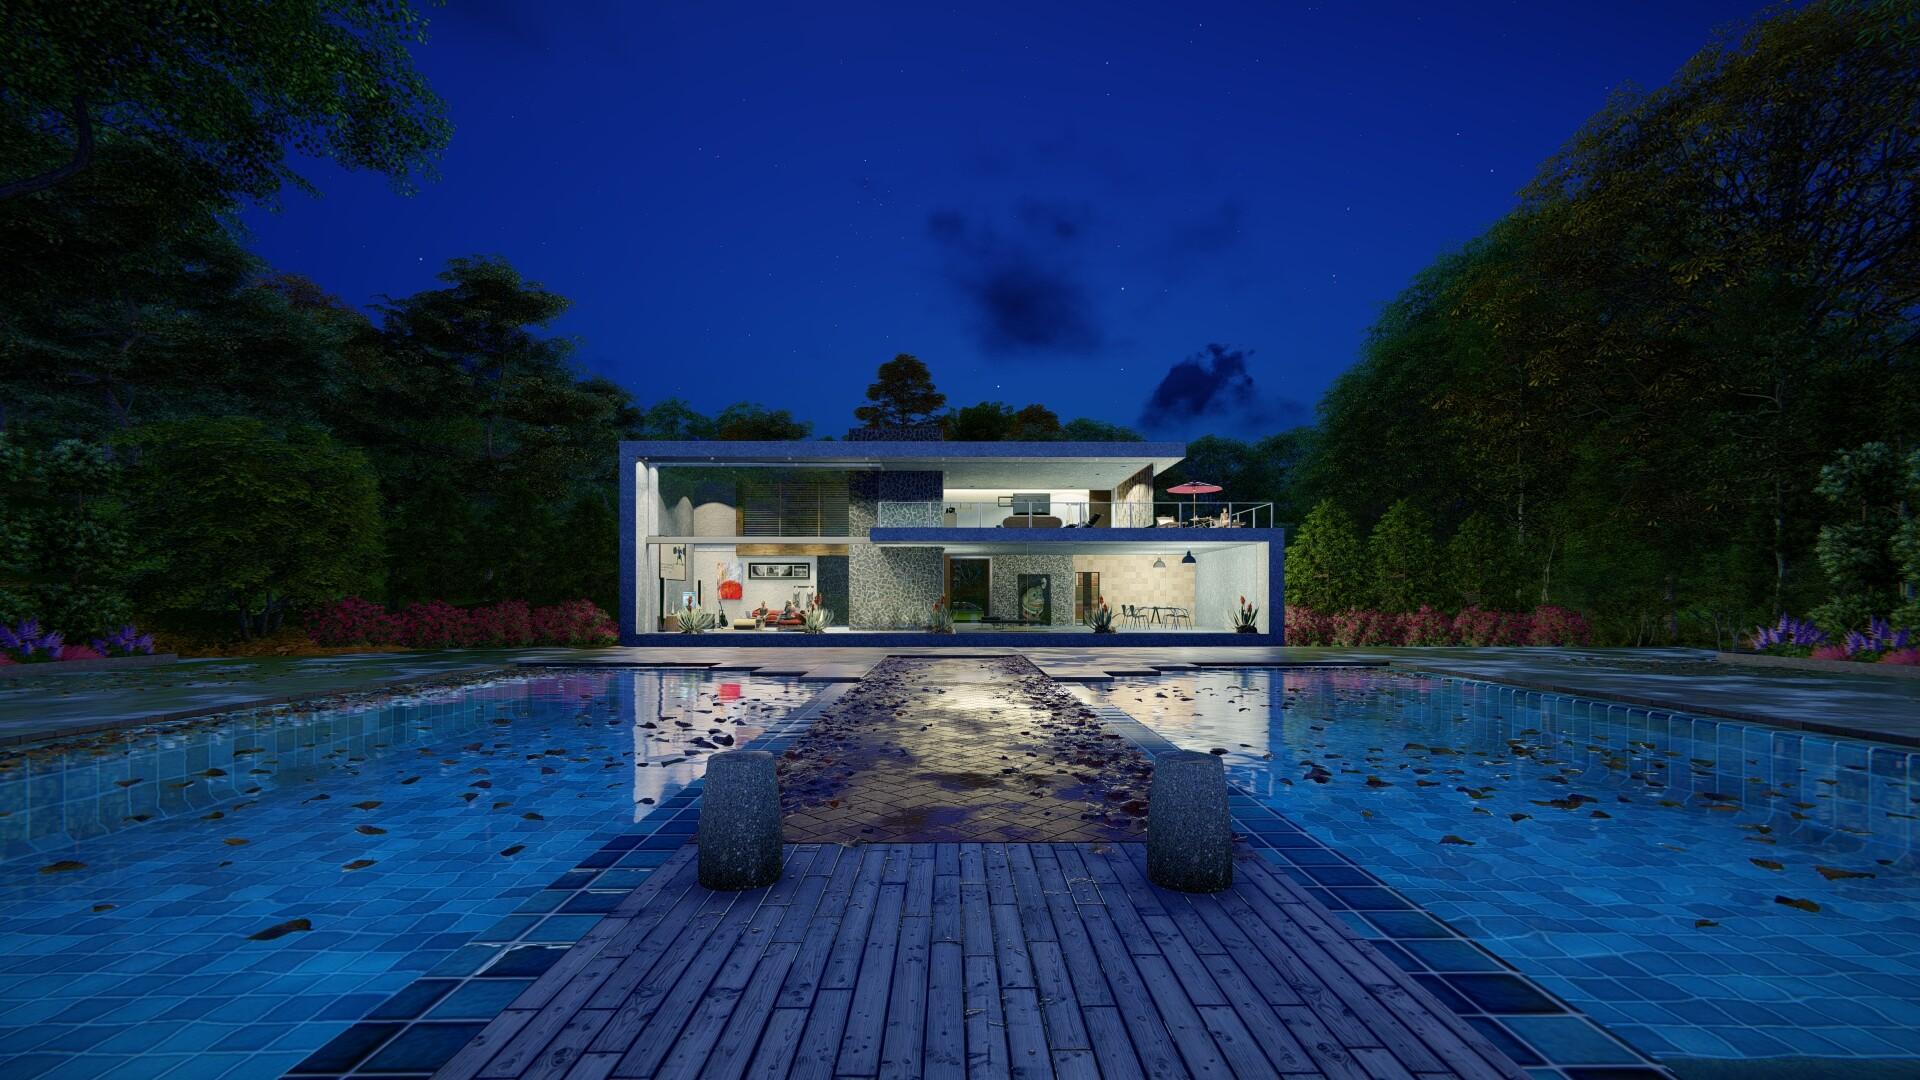 ArtStation - Night Exterior with Lumion 9 Pro , David Ladapo